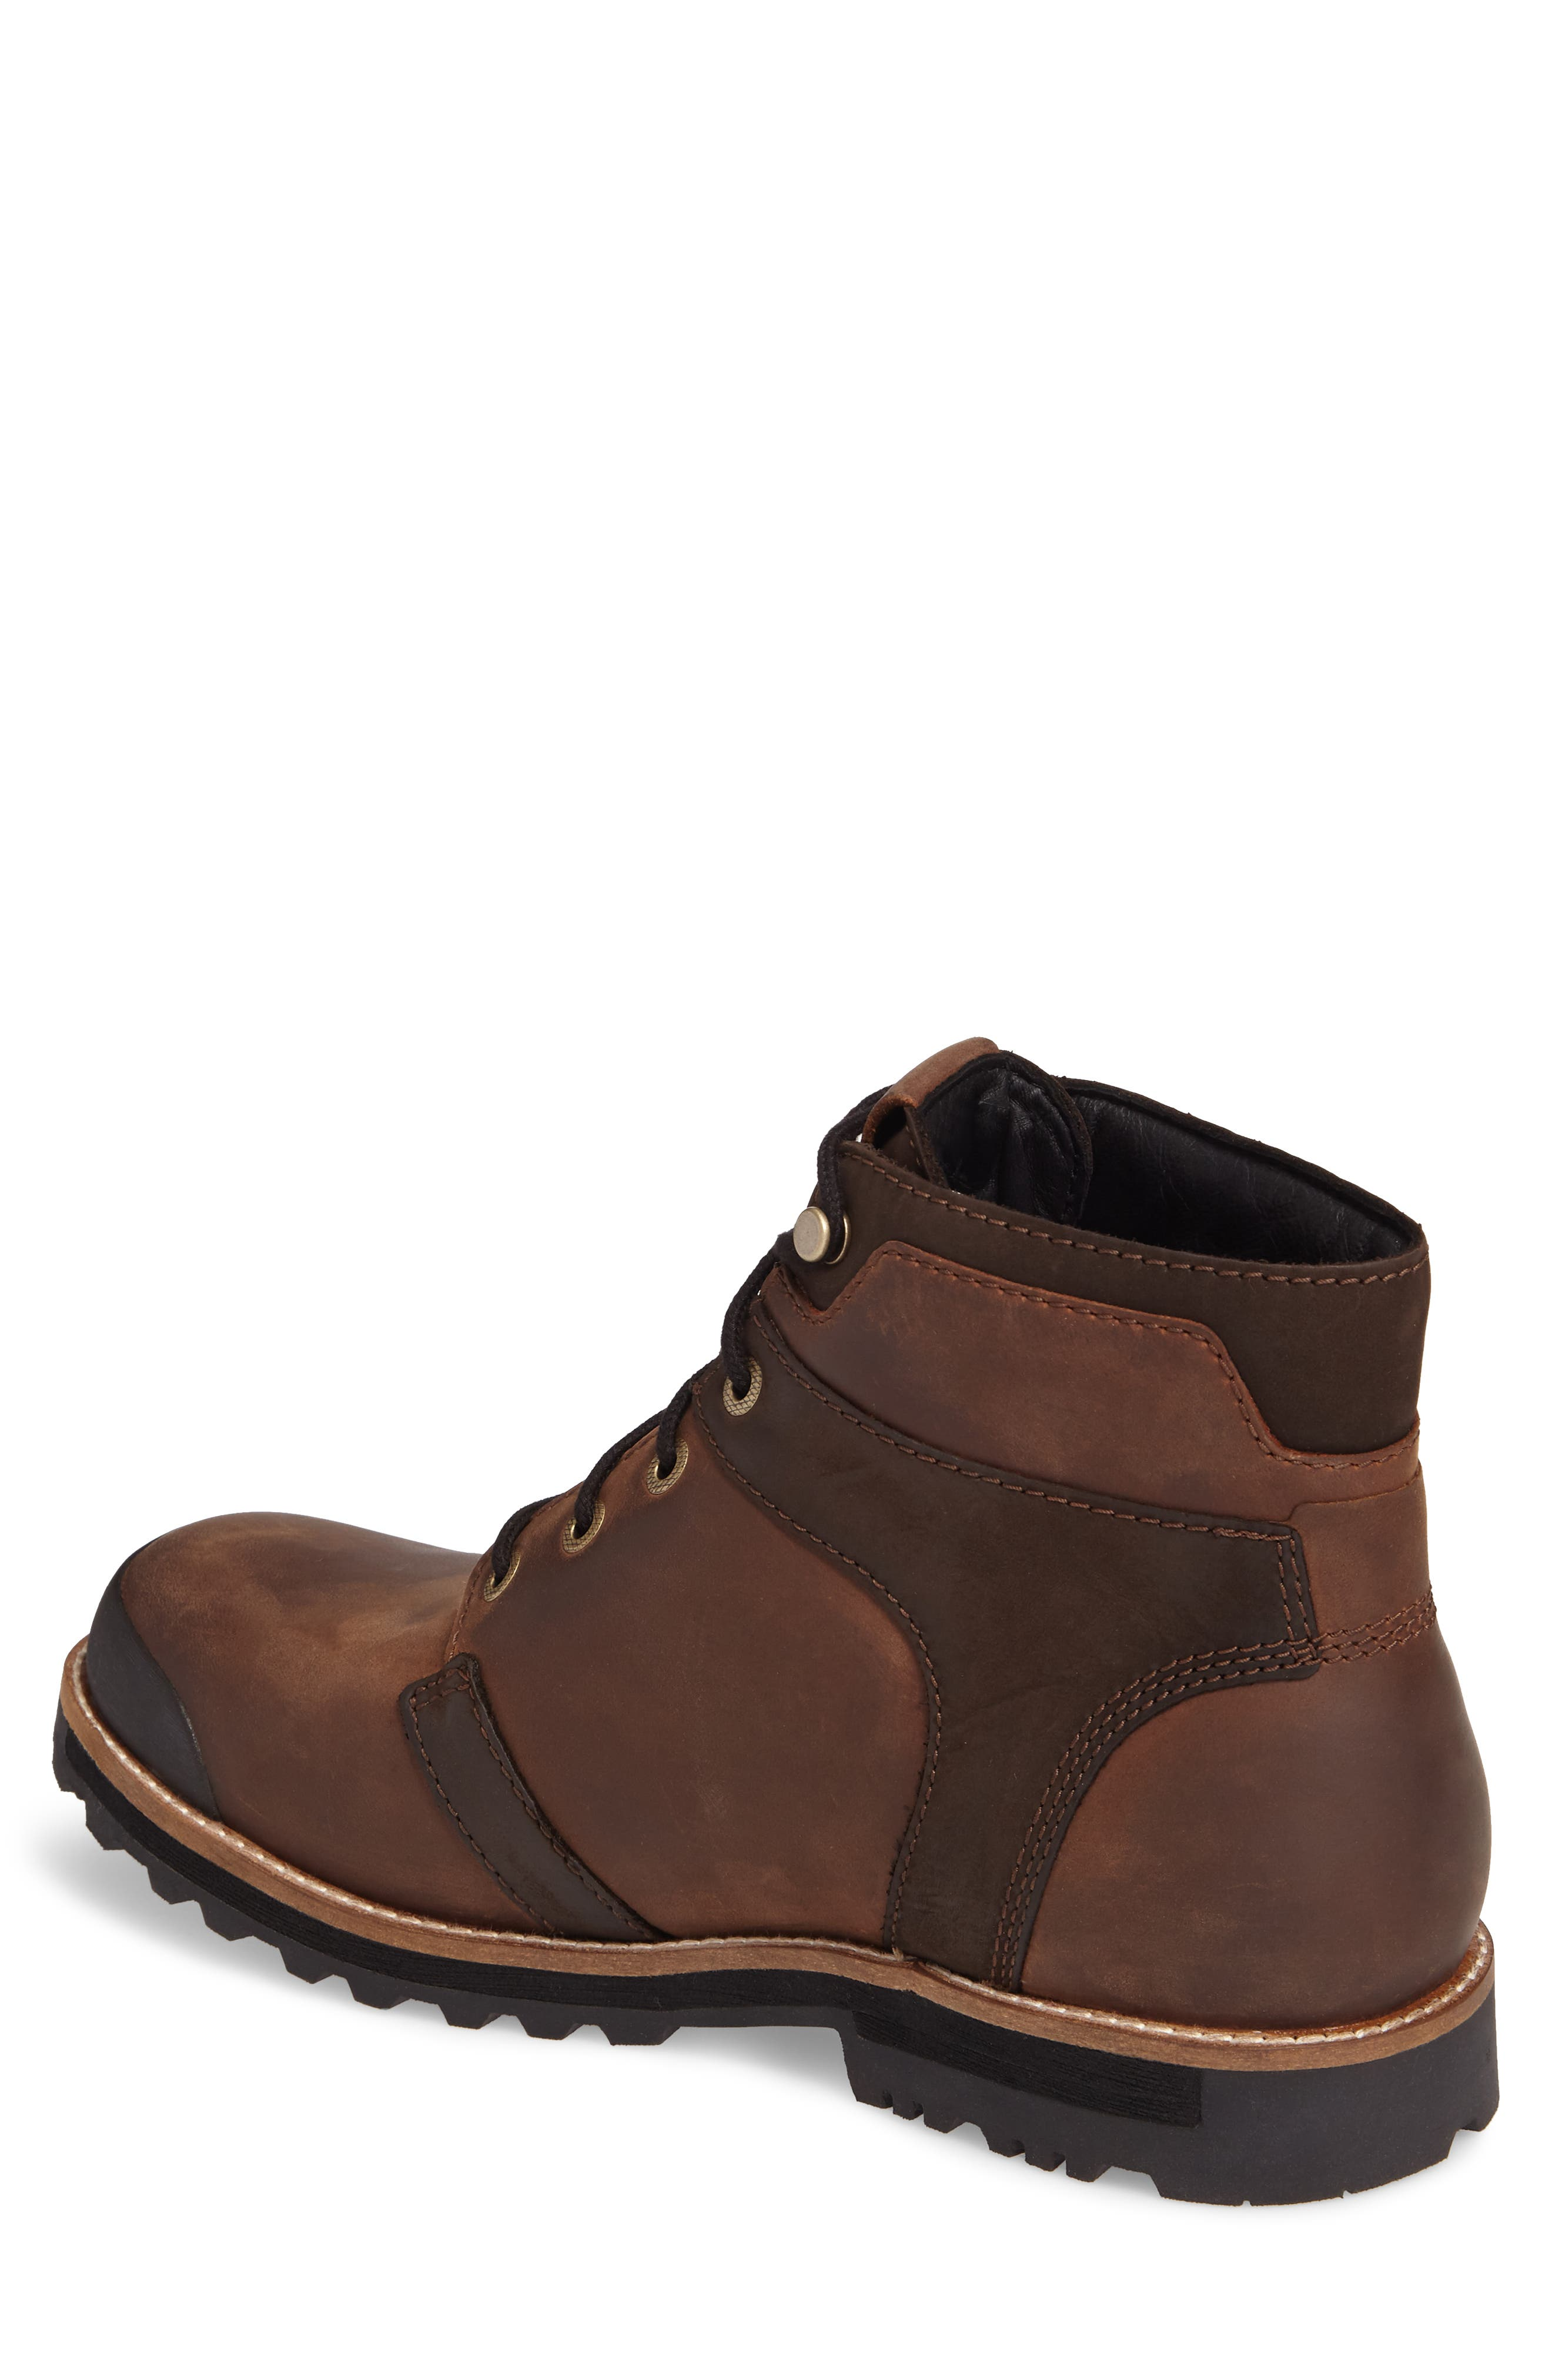 KEEN, The Rocker Waterproof Plain Toe Boot, Alternate thumbnail 2, color, BIG BEN/ EIFFEL